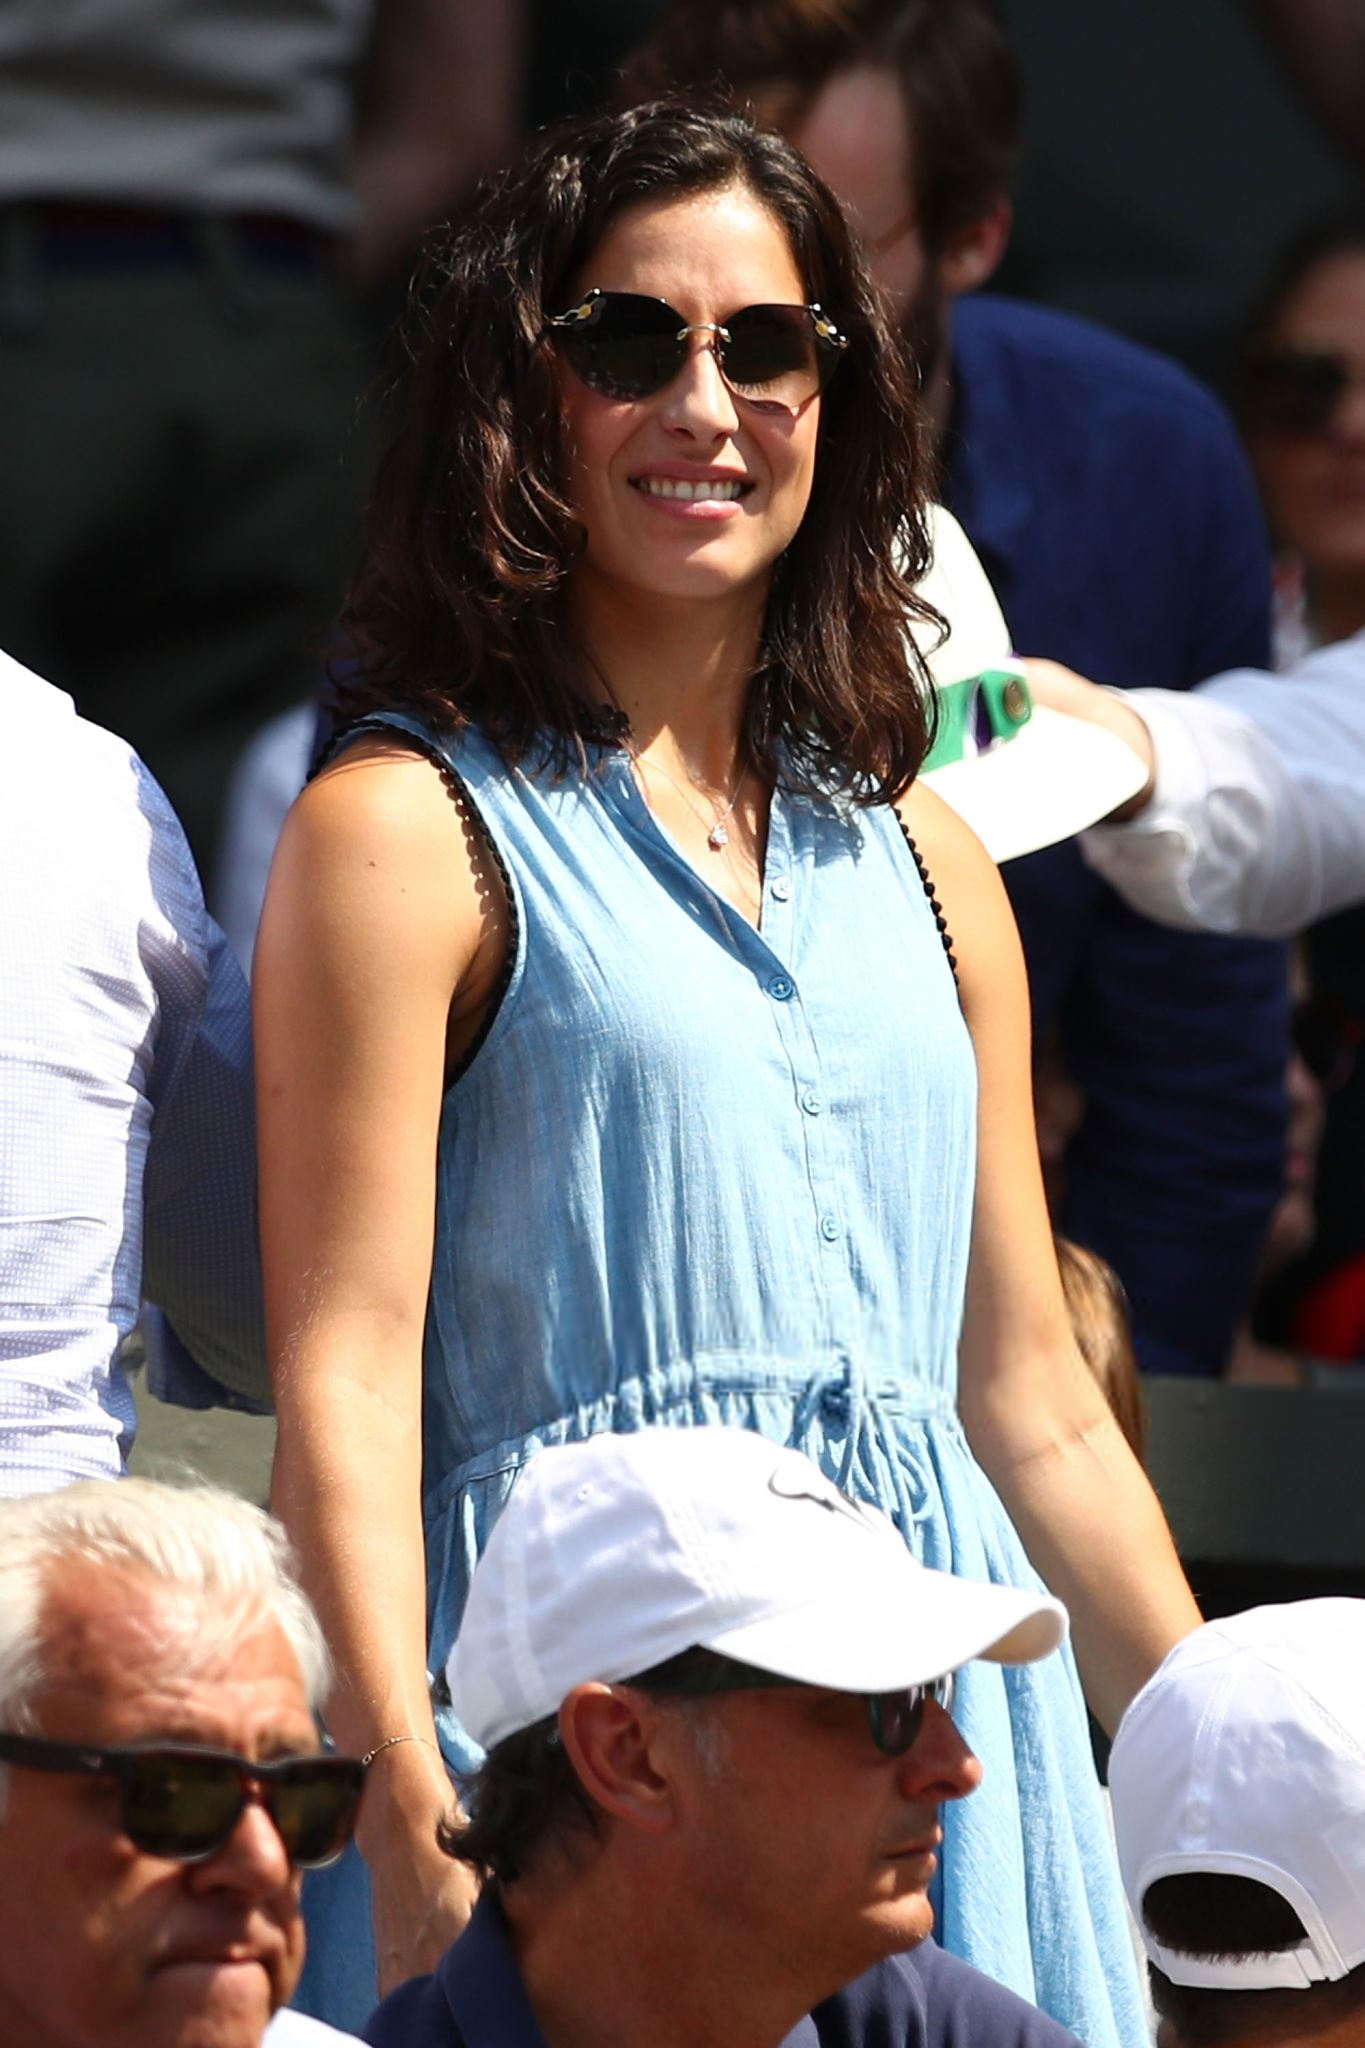 Rafael Nadal Girlfriend Maria Francisca Perello At Wimbledon Third Round Photo 2018 1 Rafael Nadal Fans